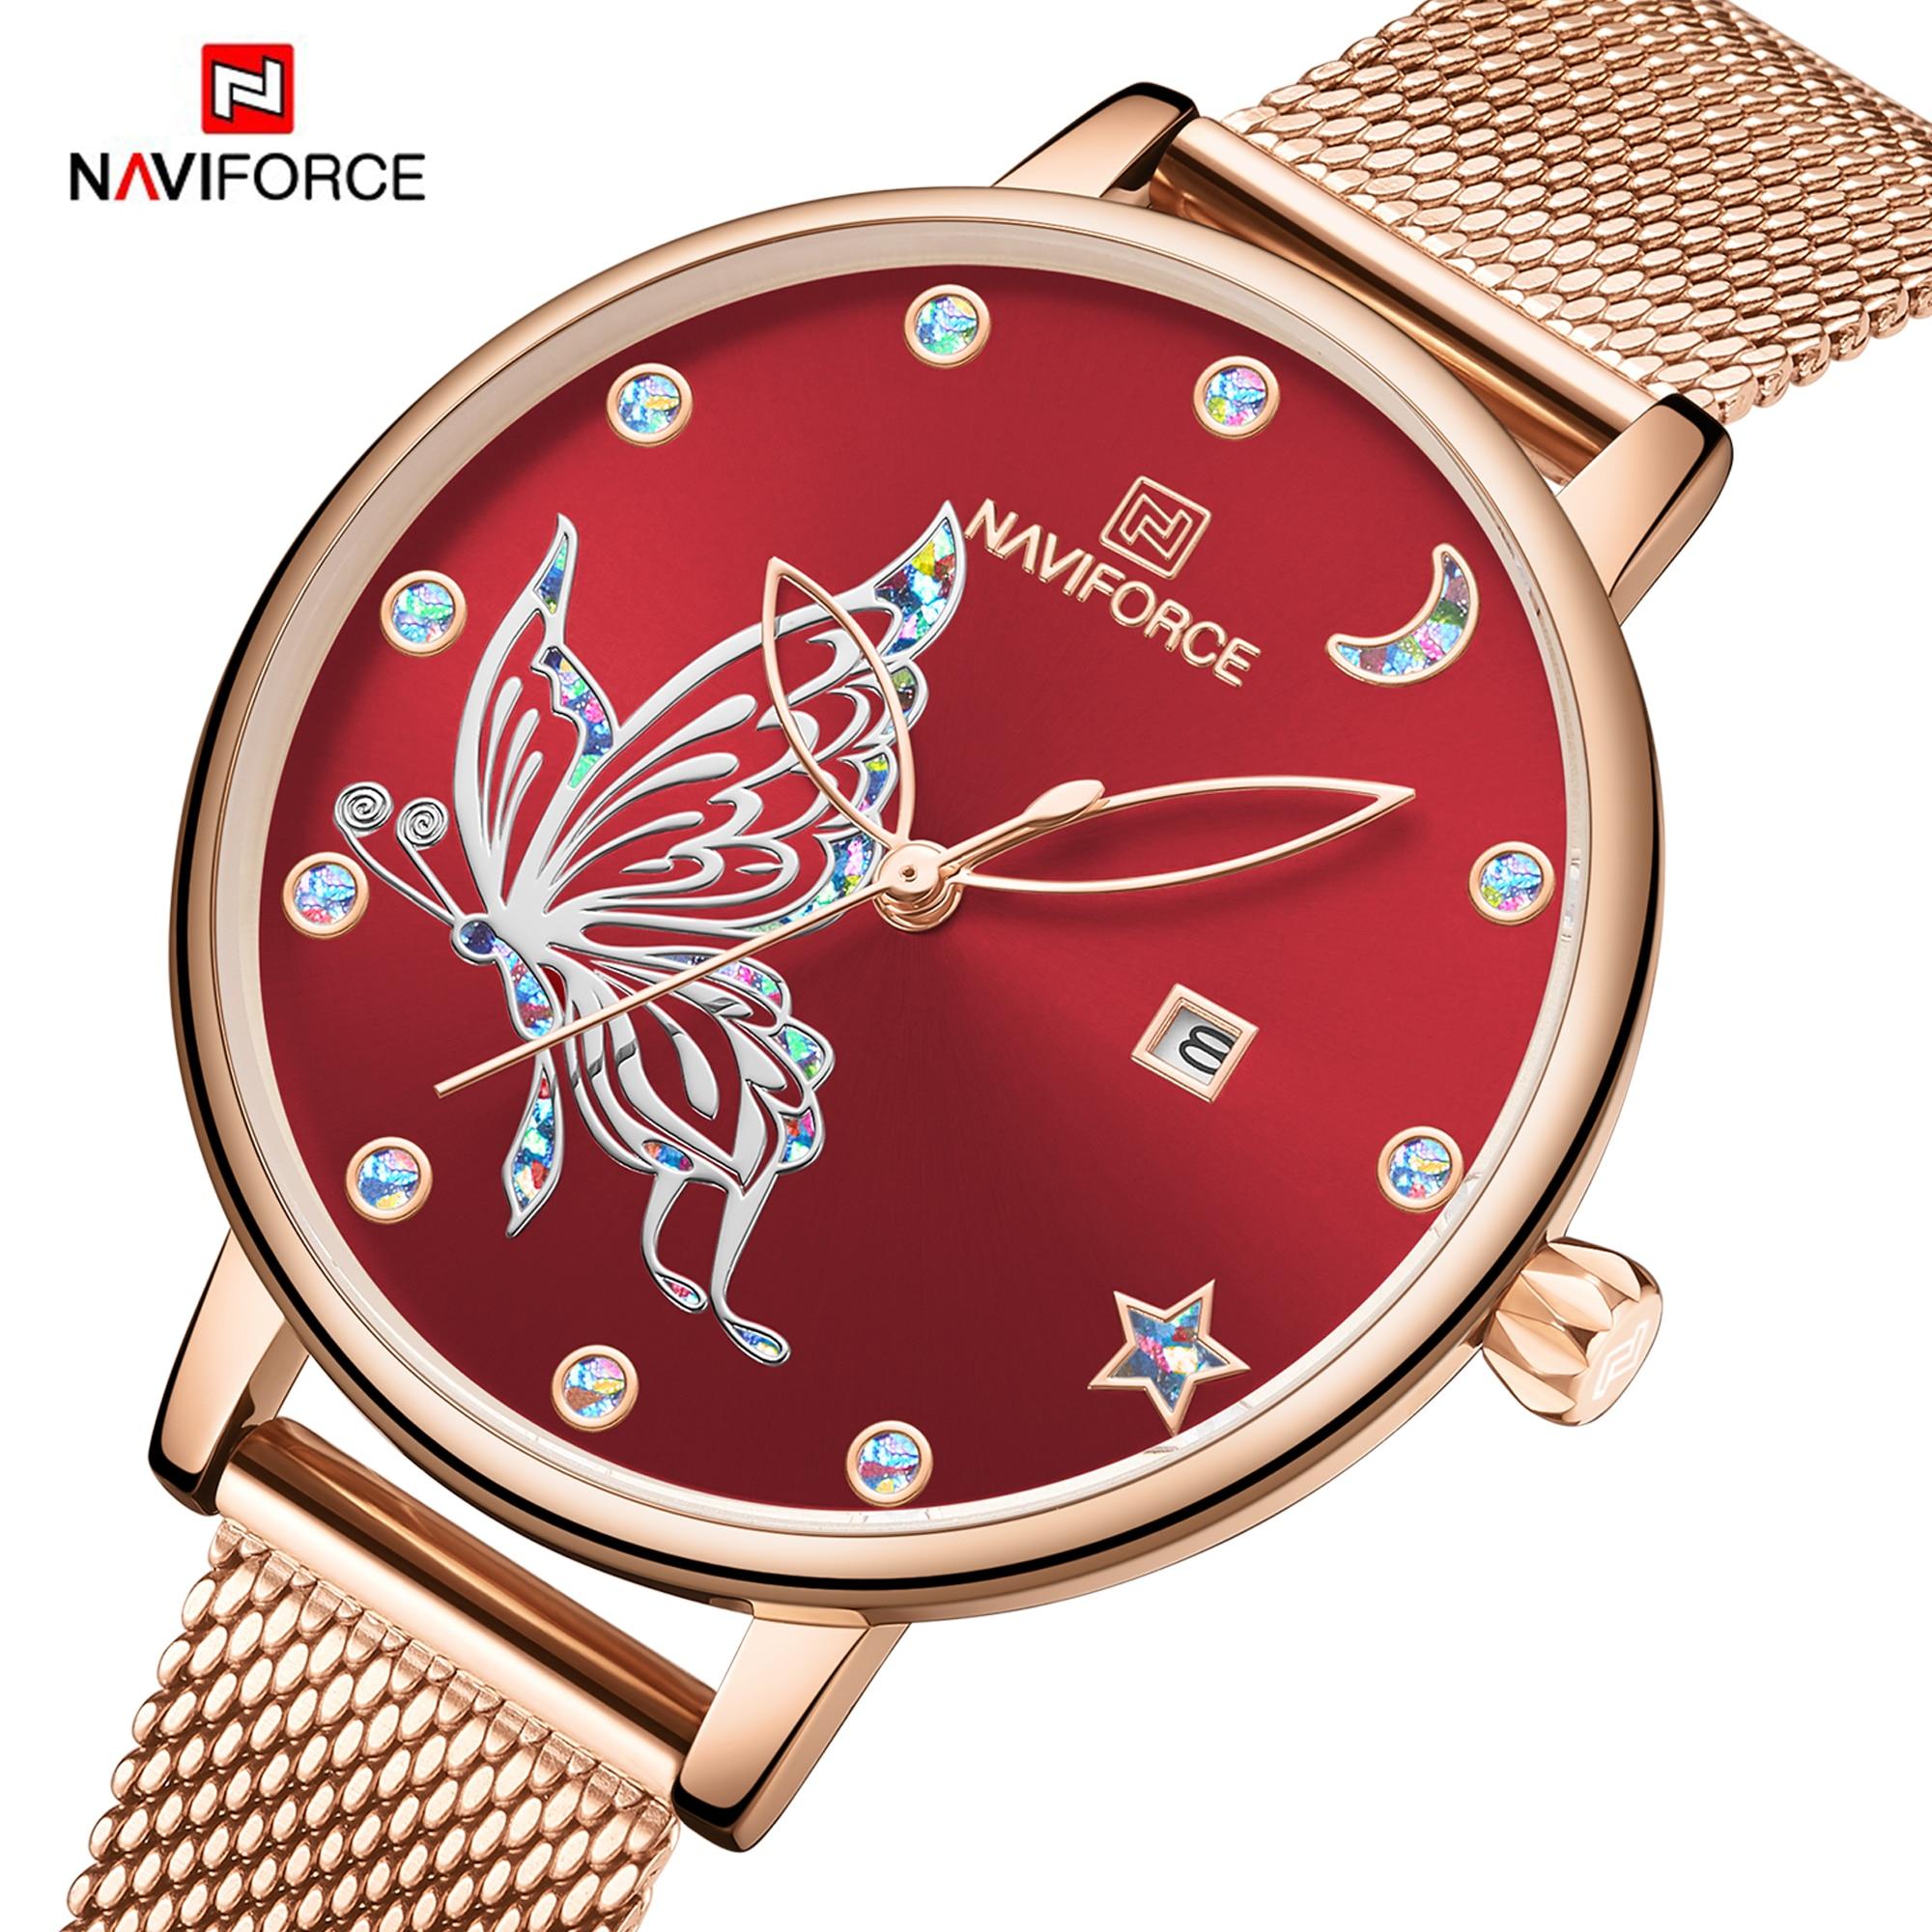 2019 NAVIFORCE Luxury Brand Women Watches Fashion Casual Quartz Ladies wrist watch Steel strap Waterproof Clock Relogio Feminino